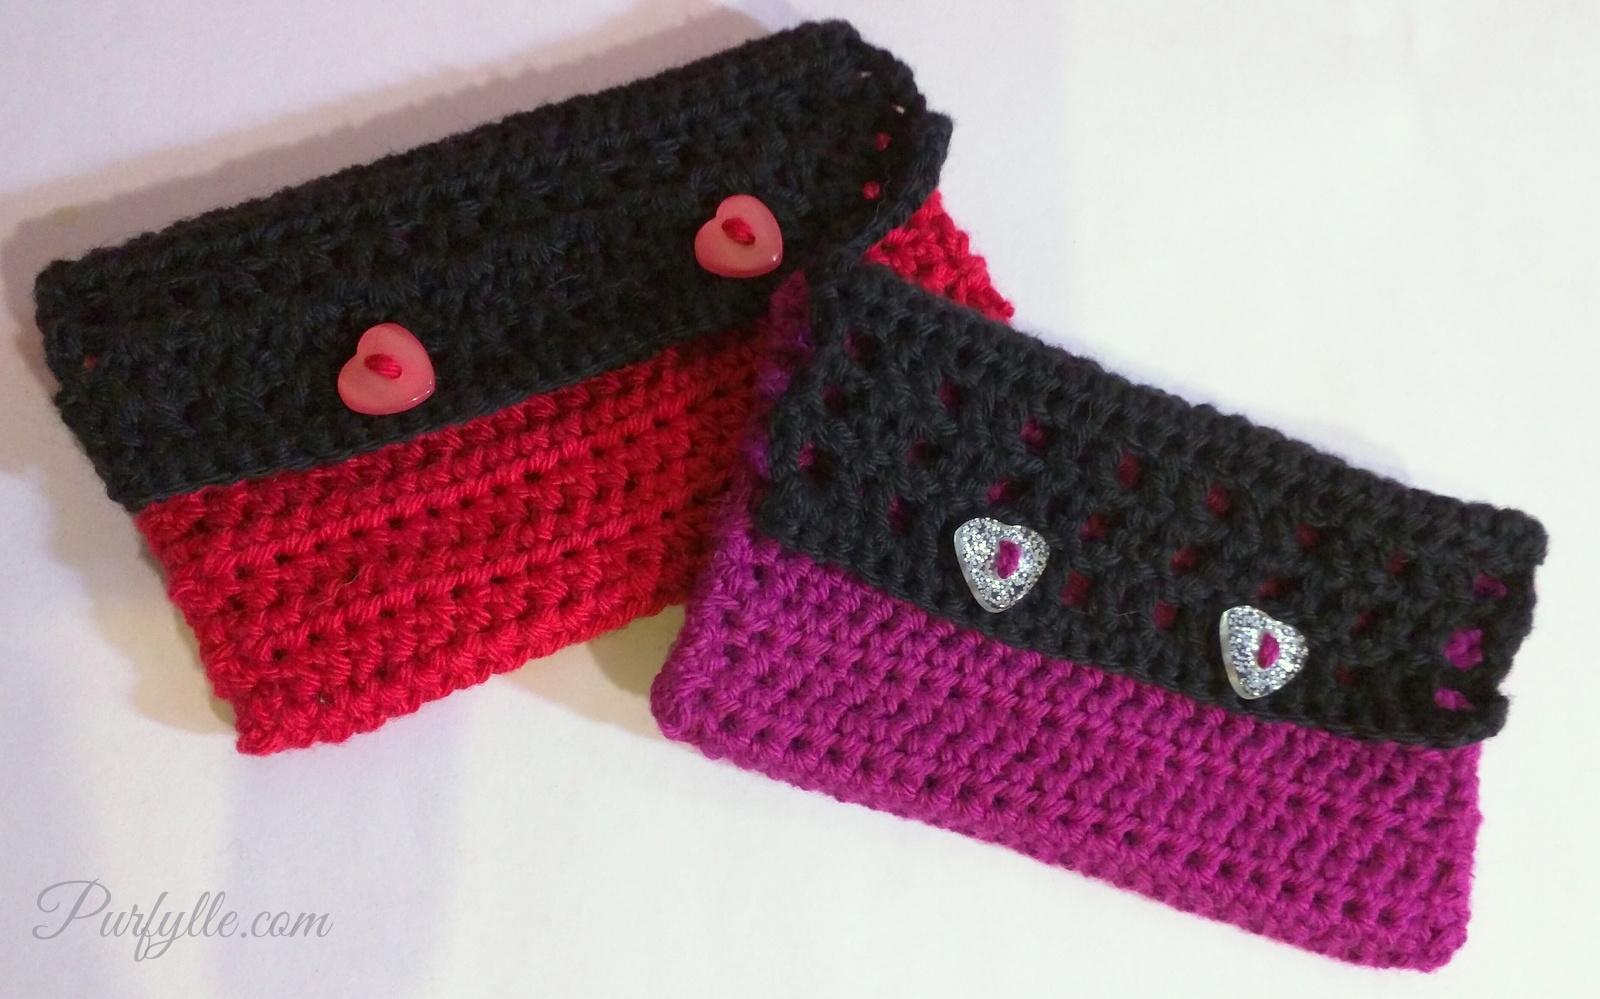 Free Crochet Pattern Gift Card : Purfylle: Crochet Gift Card Envelope - Free Pattern